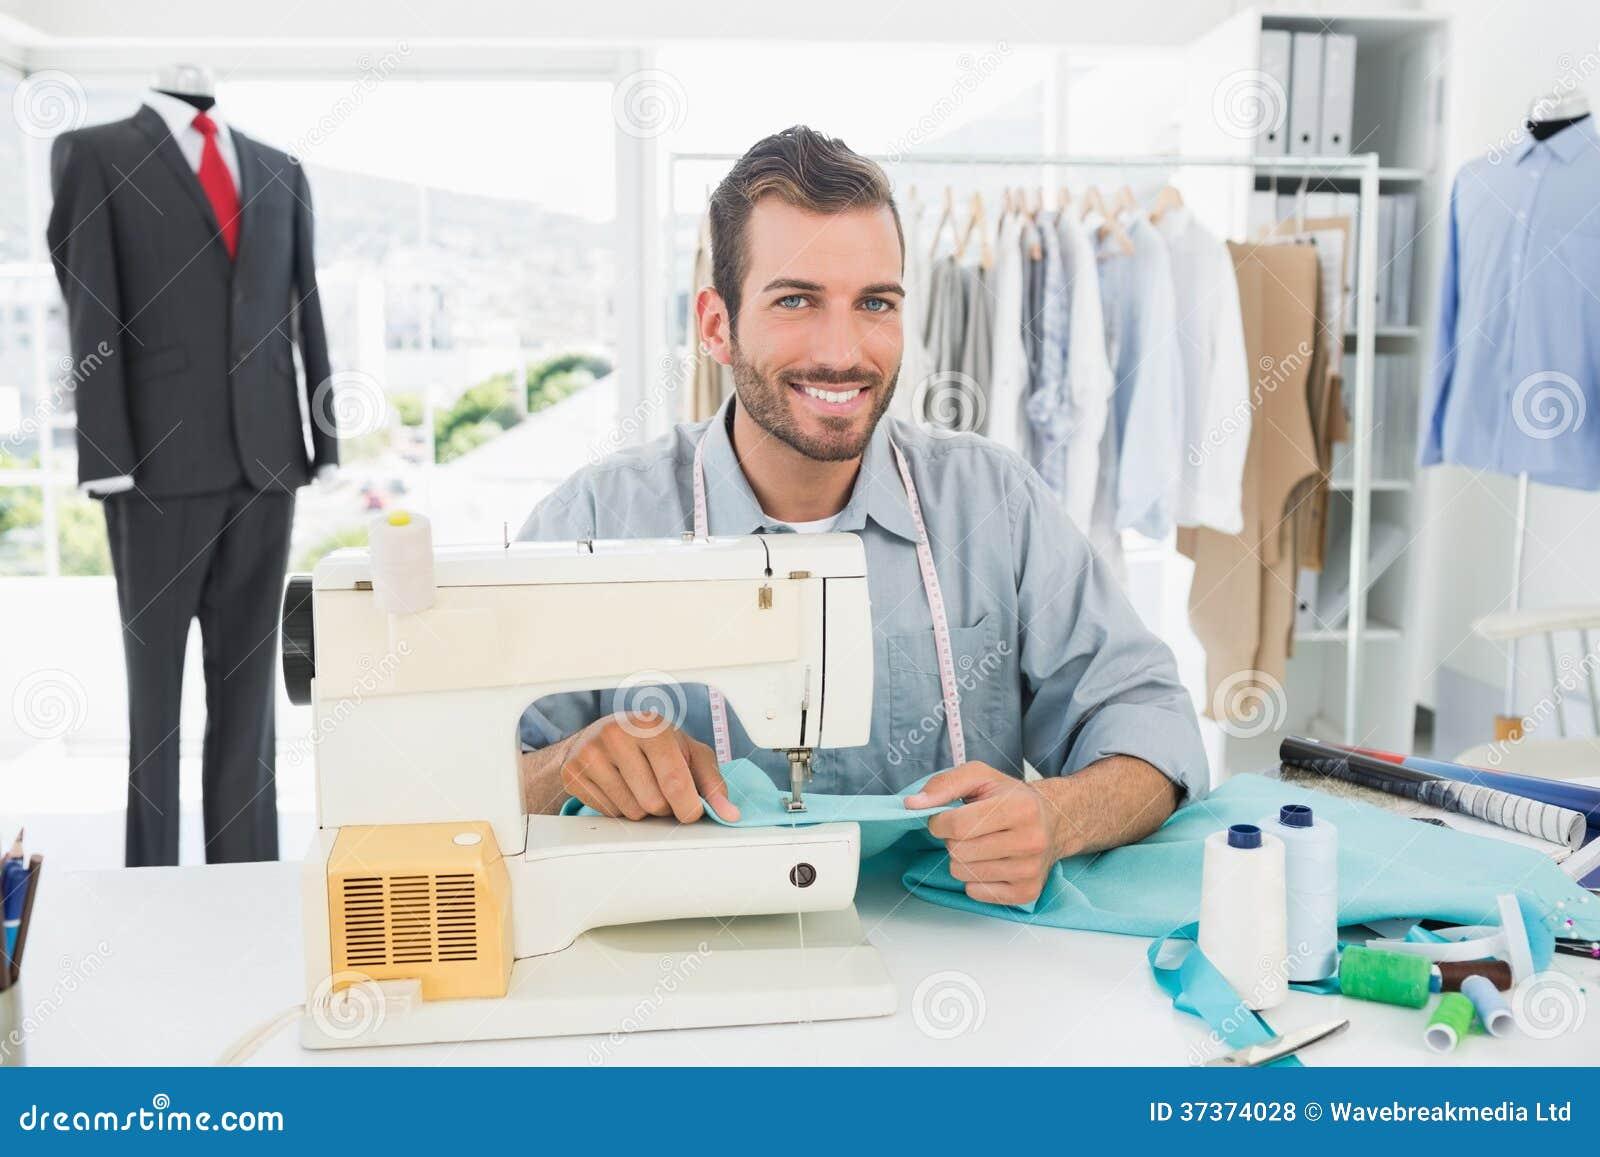 Male Fashion Designer Workshop